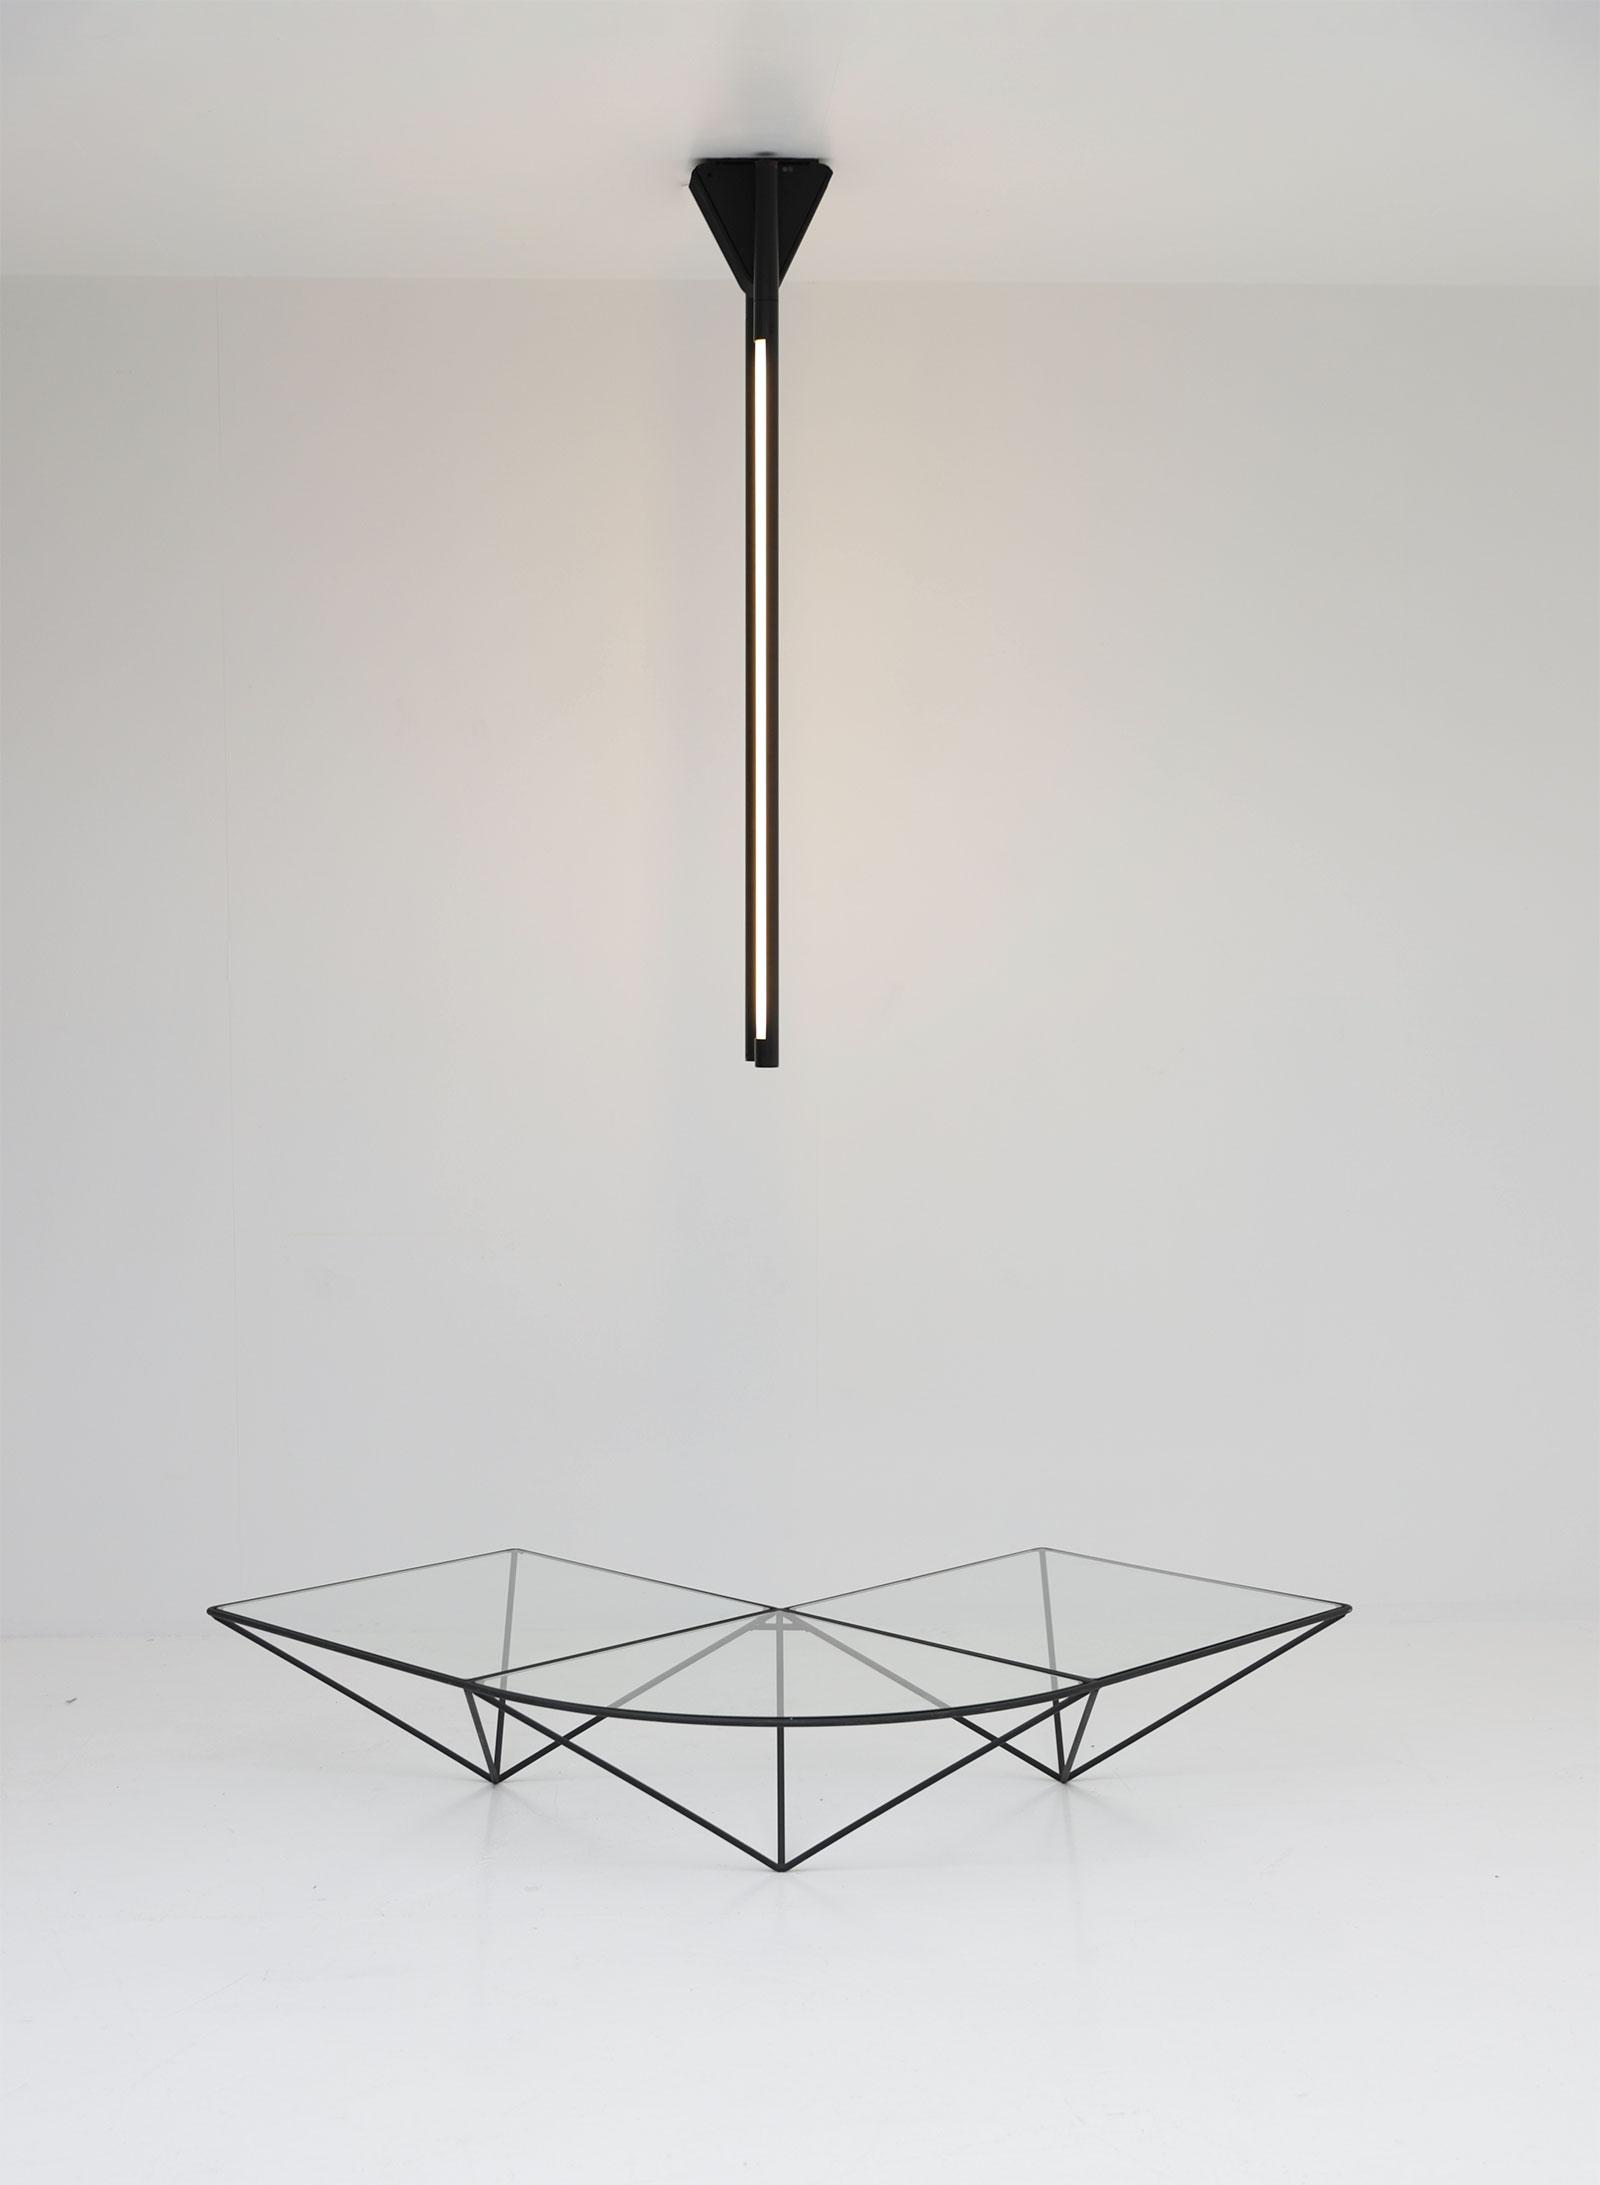 Rodolfo Bonetto Wall, Ceiling or Floor lampimage 7